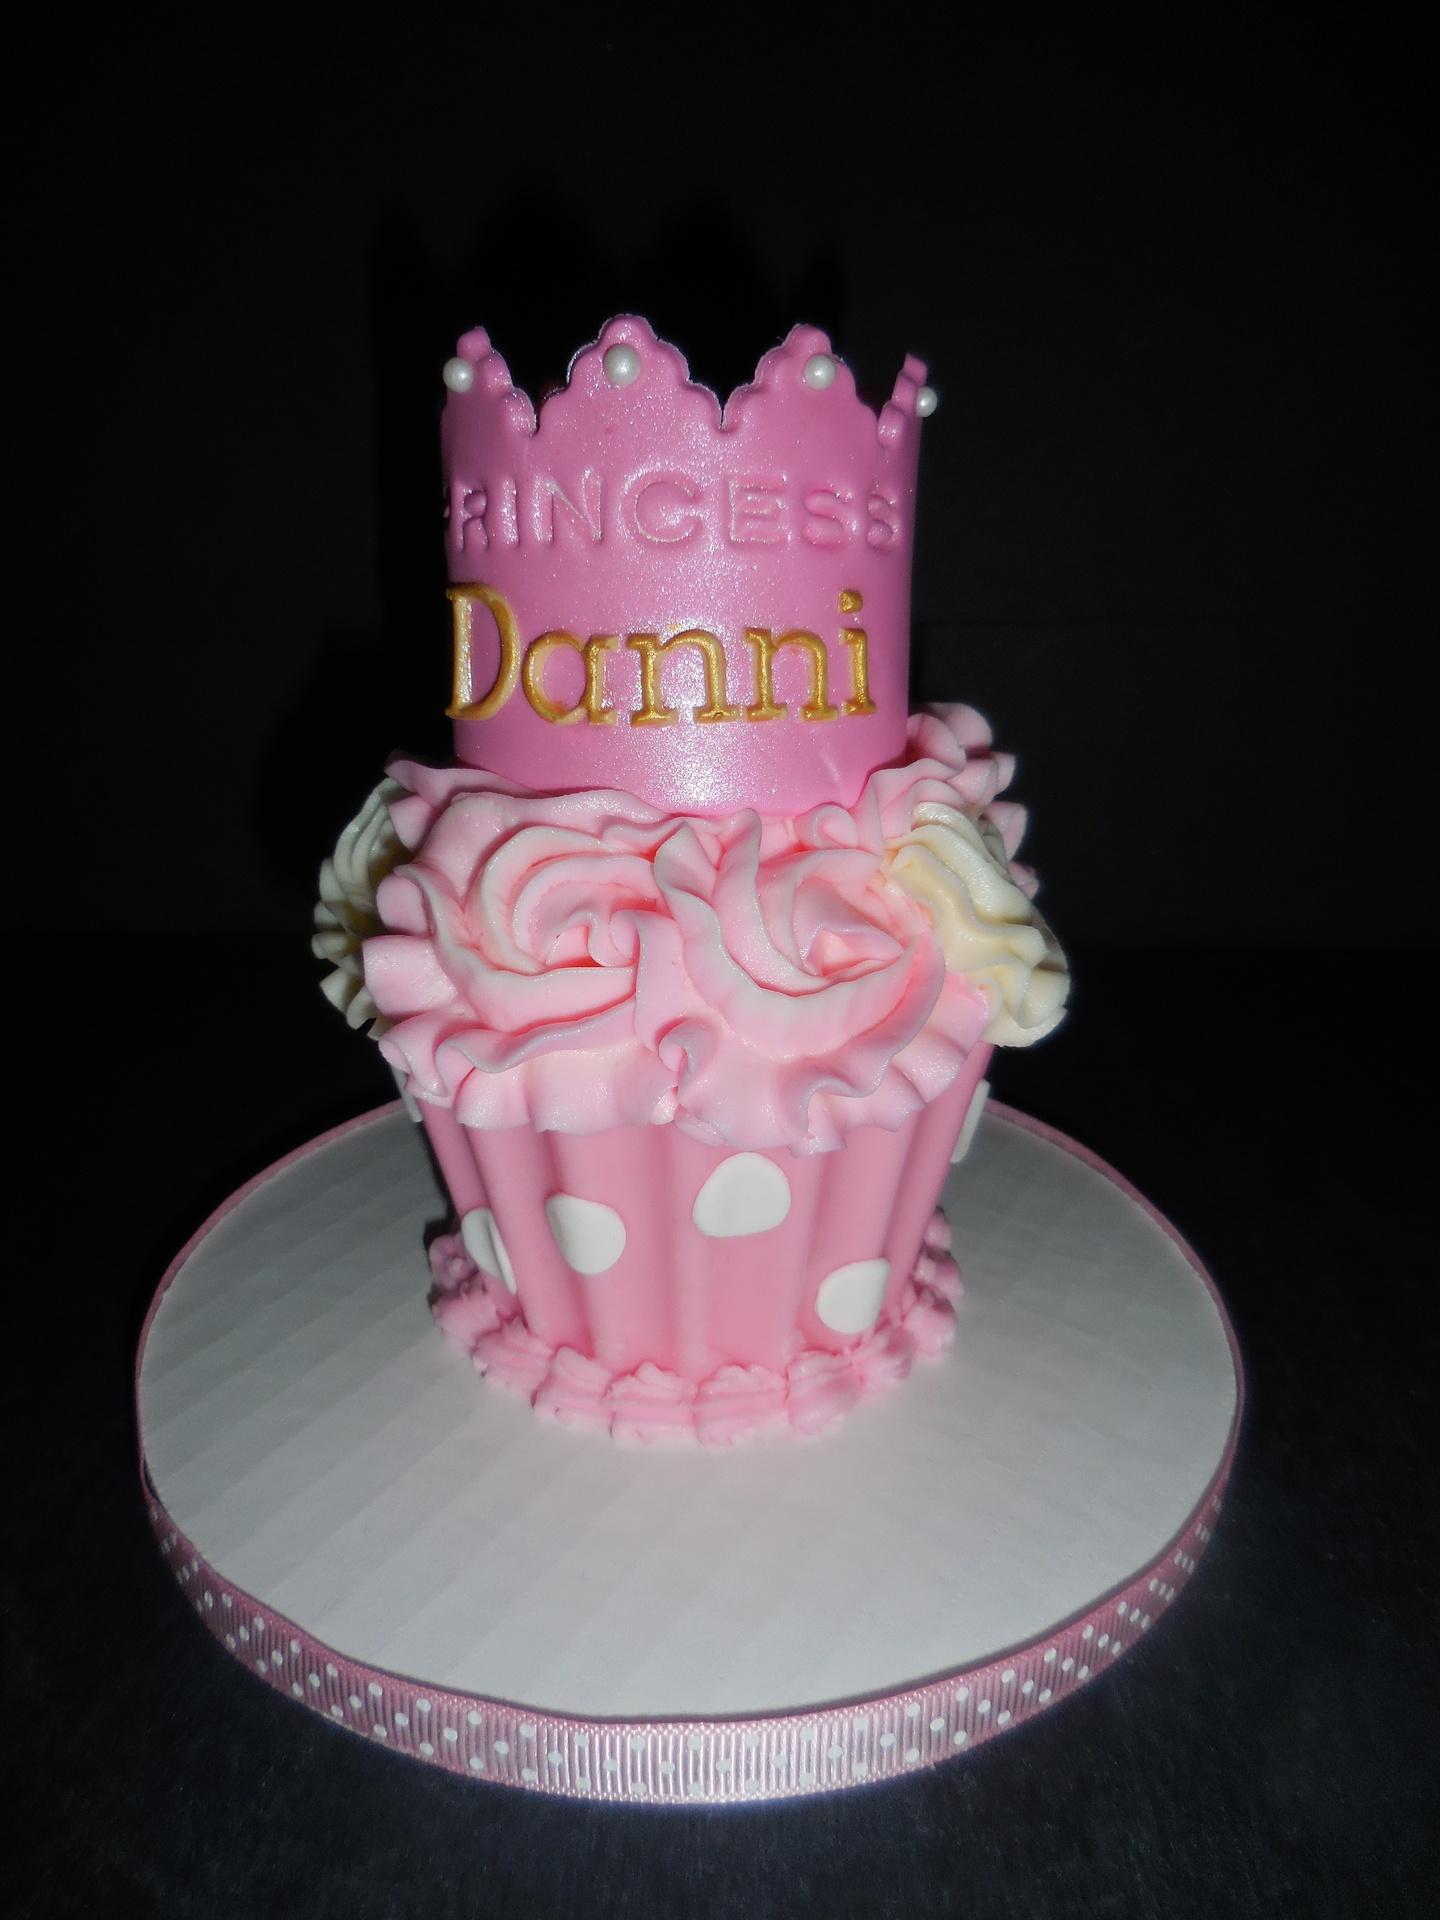 Danni's Princess Cupcake Smash Cake